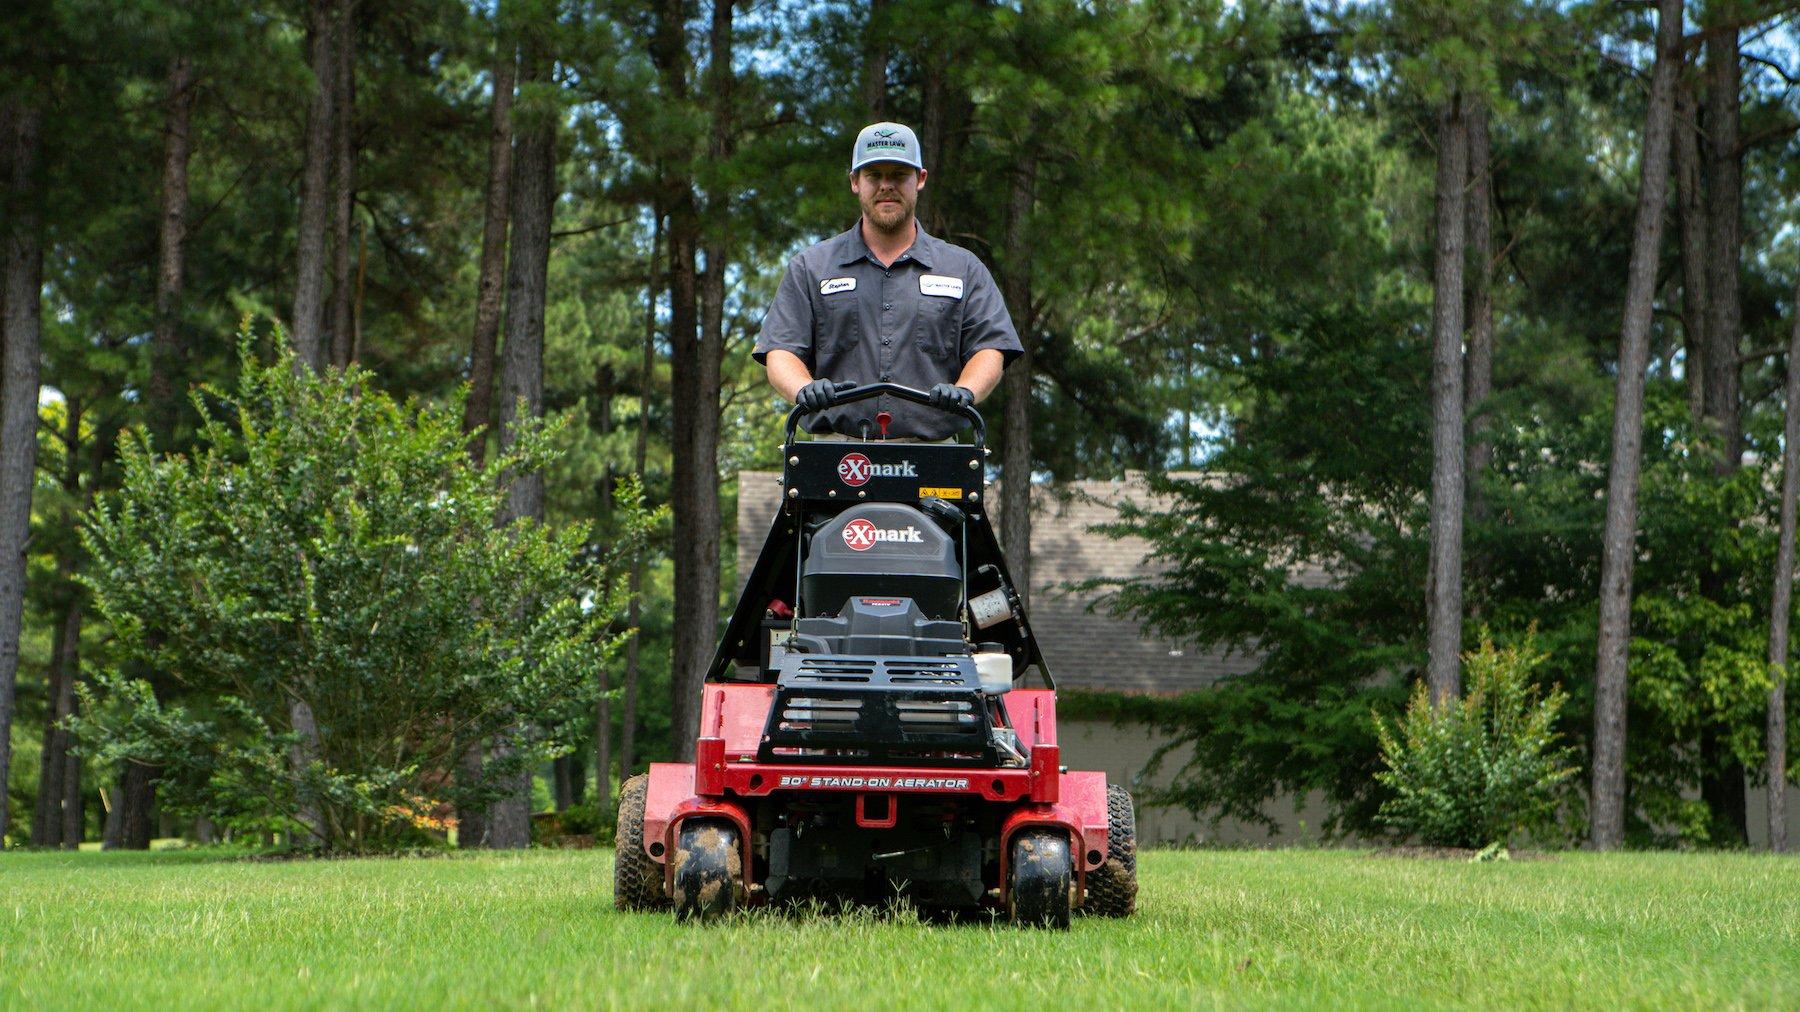 Lawn care technician using an aerator